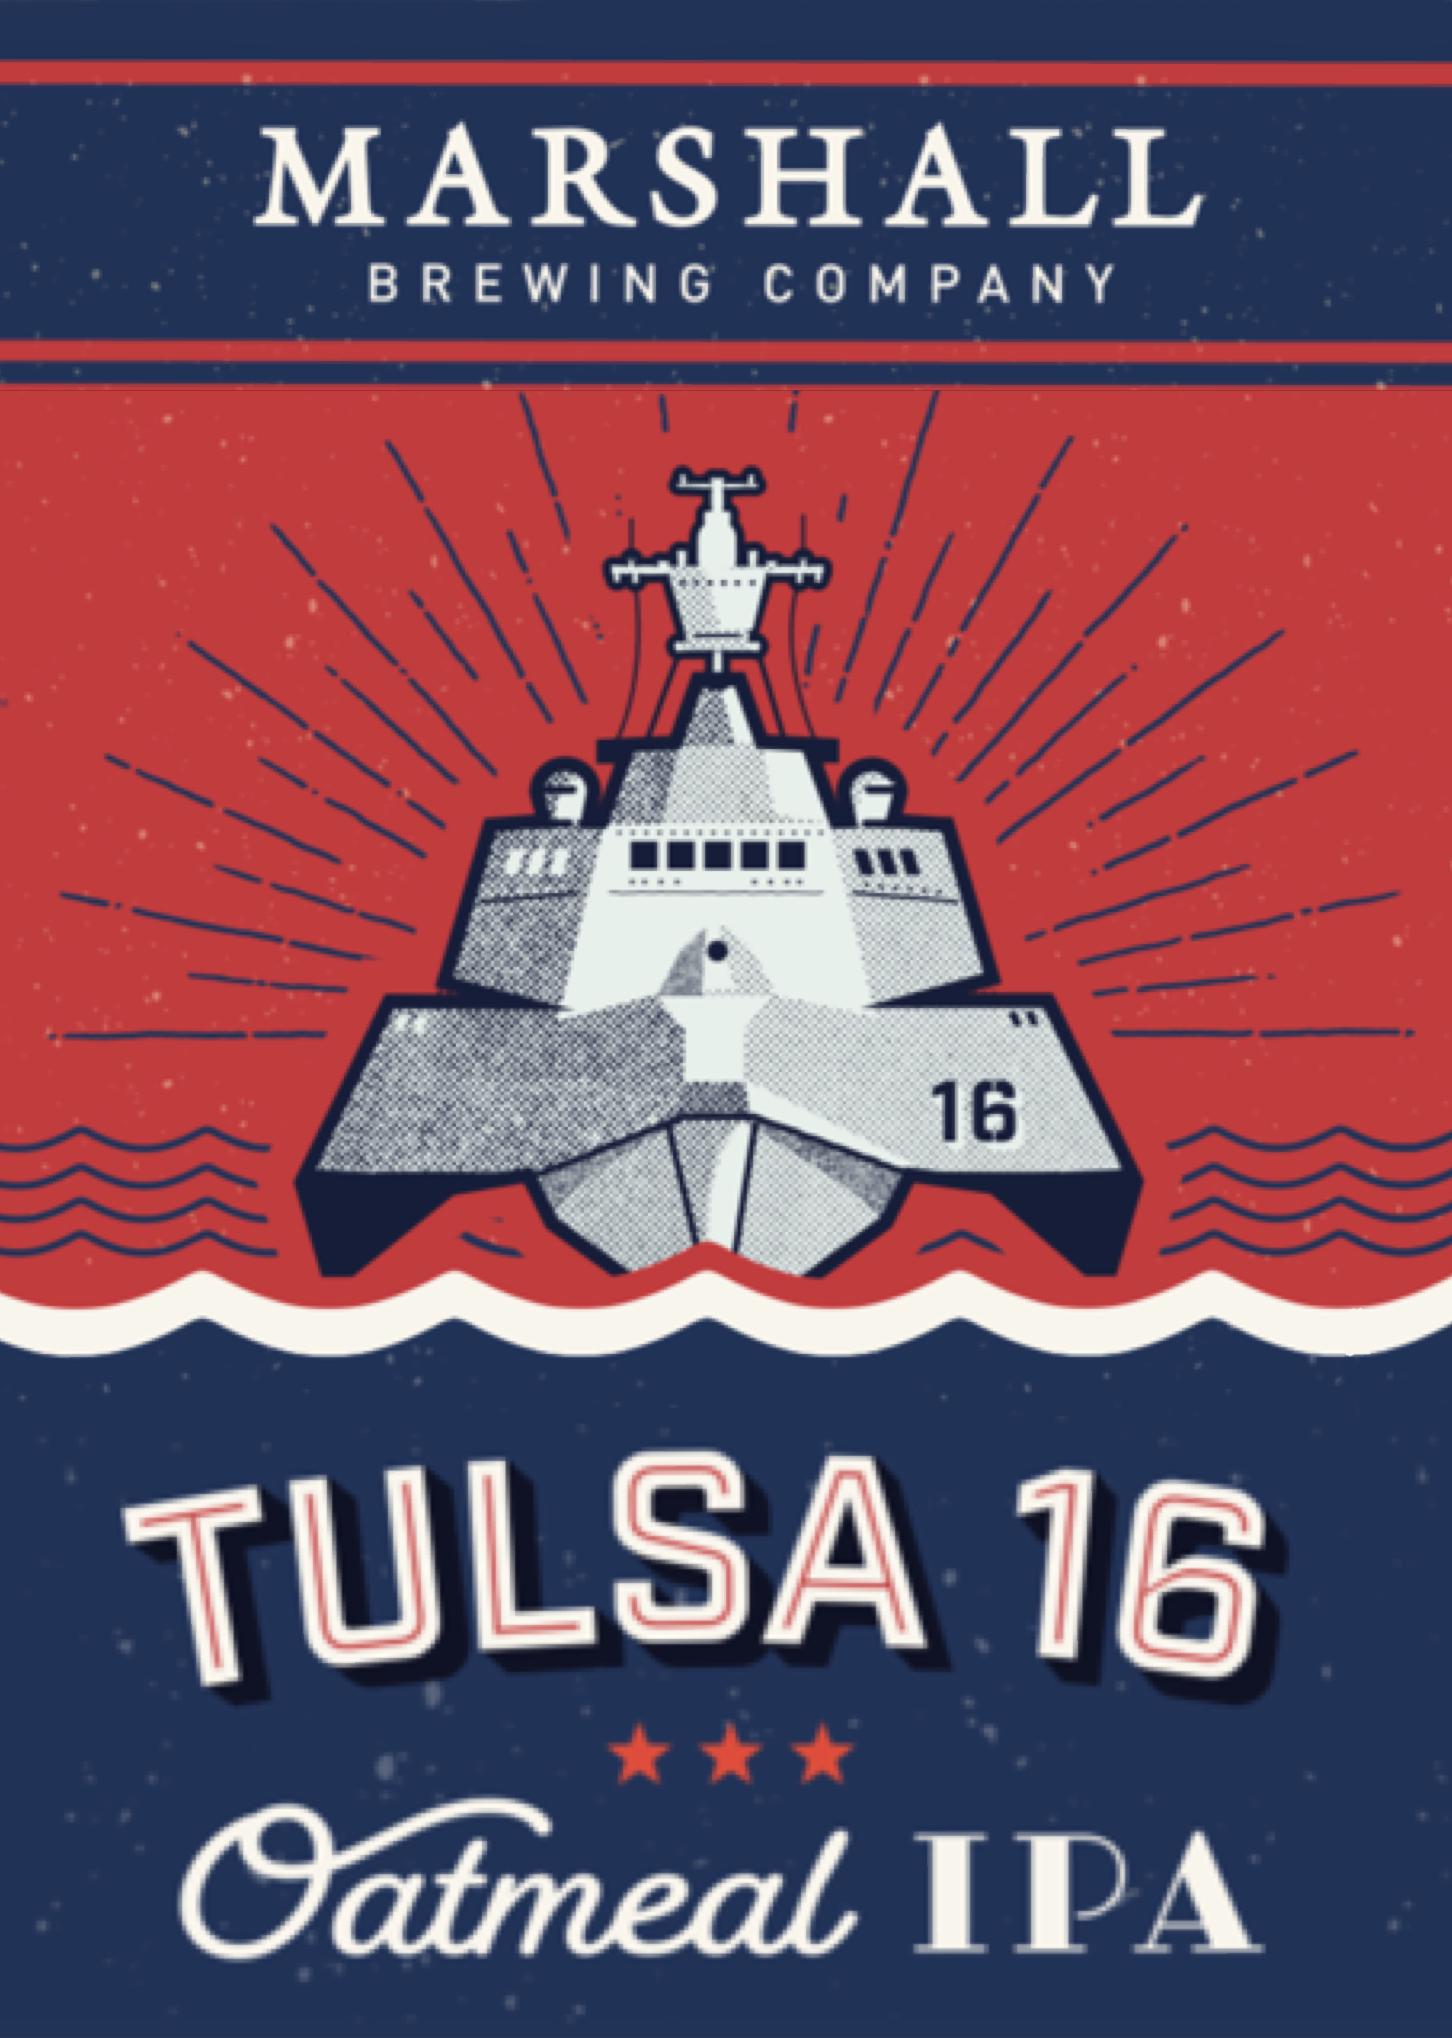 Tulsa '16 Oatmeal IPA